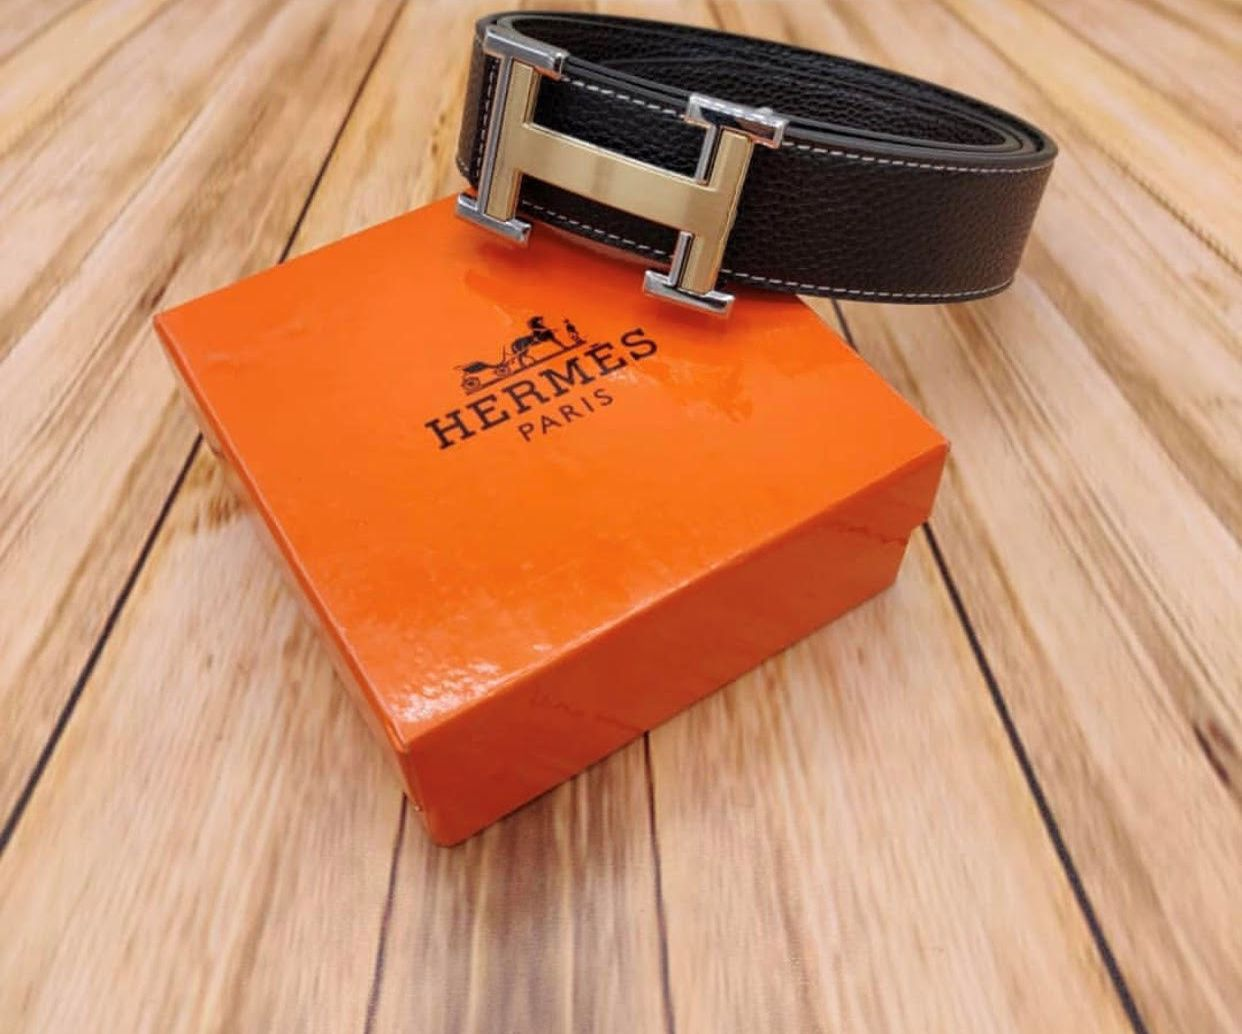 48a530784c33 How To Spot A Fake Hermes Belt! - Brands Blogger